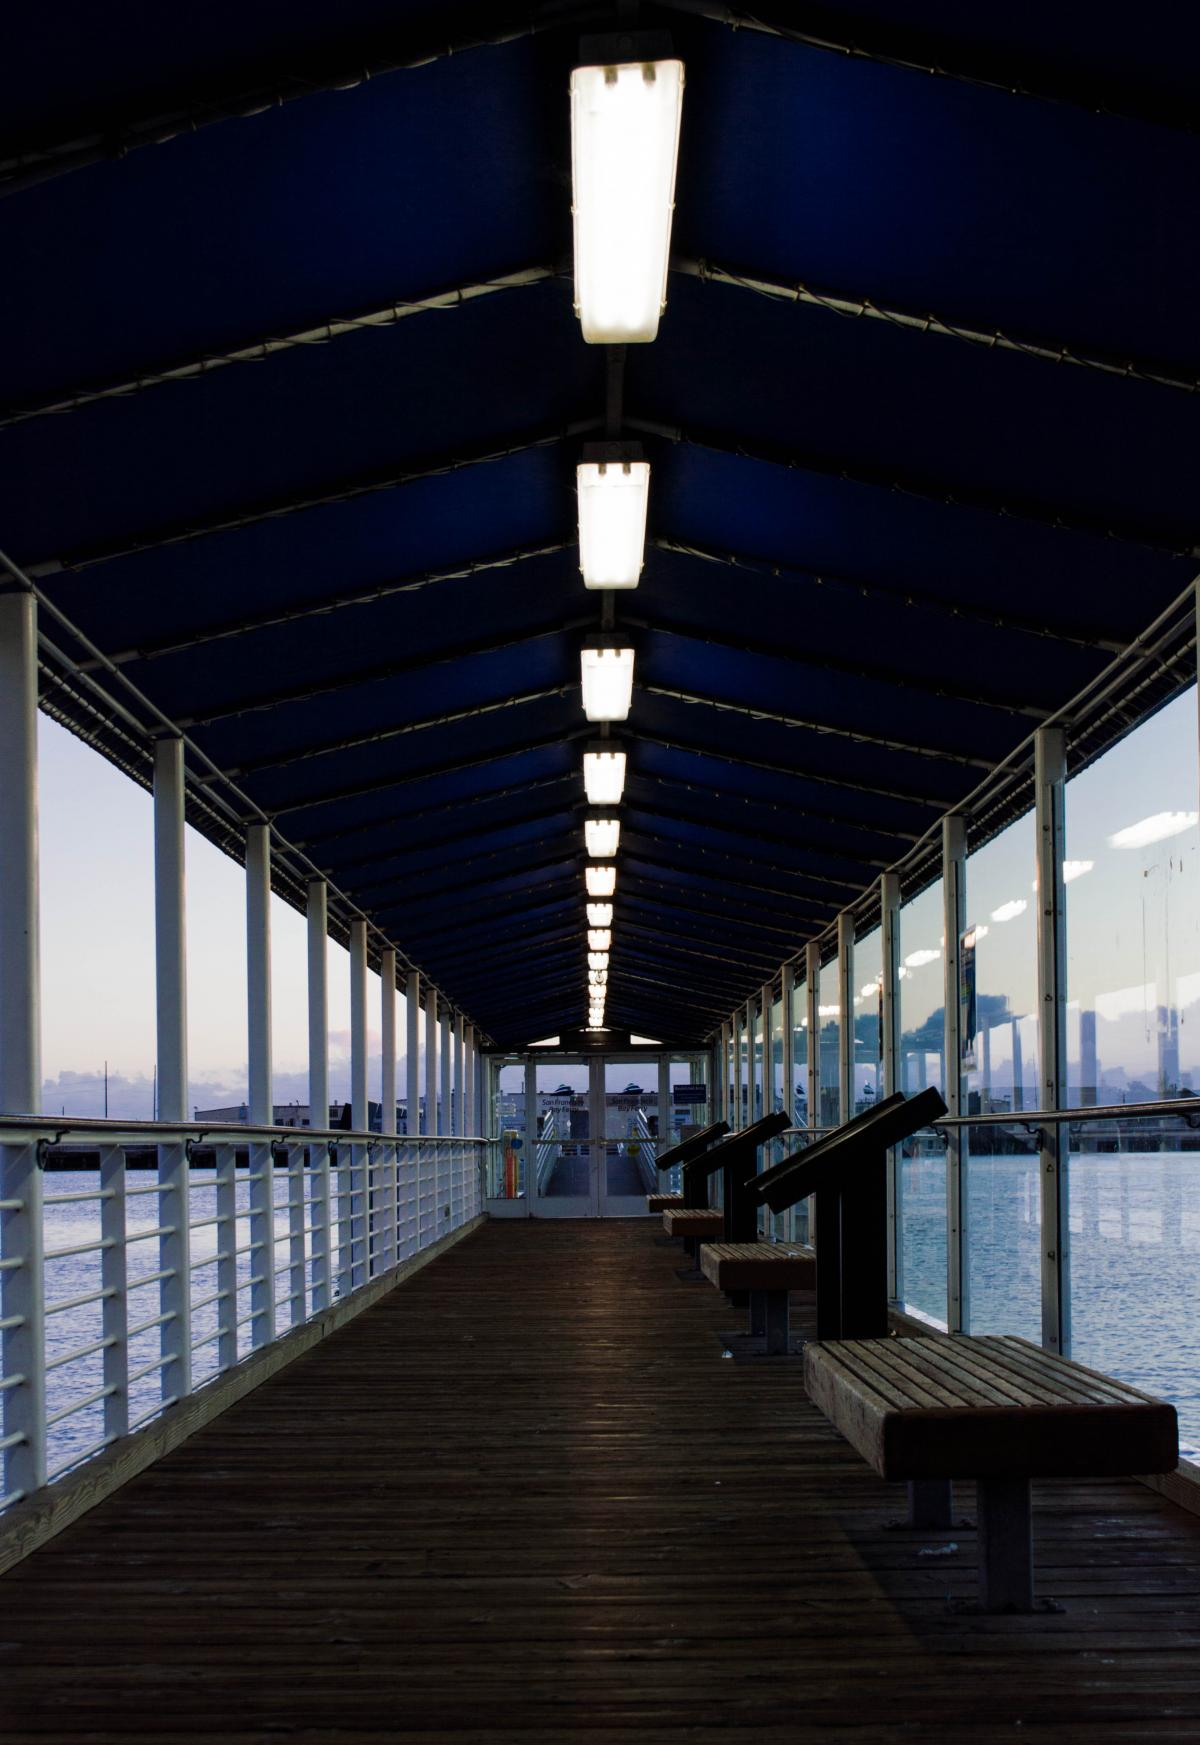 Puente Arquitectura Ciudad #102705